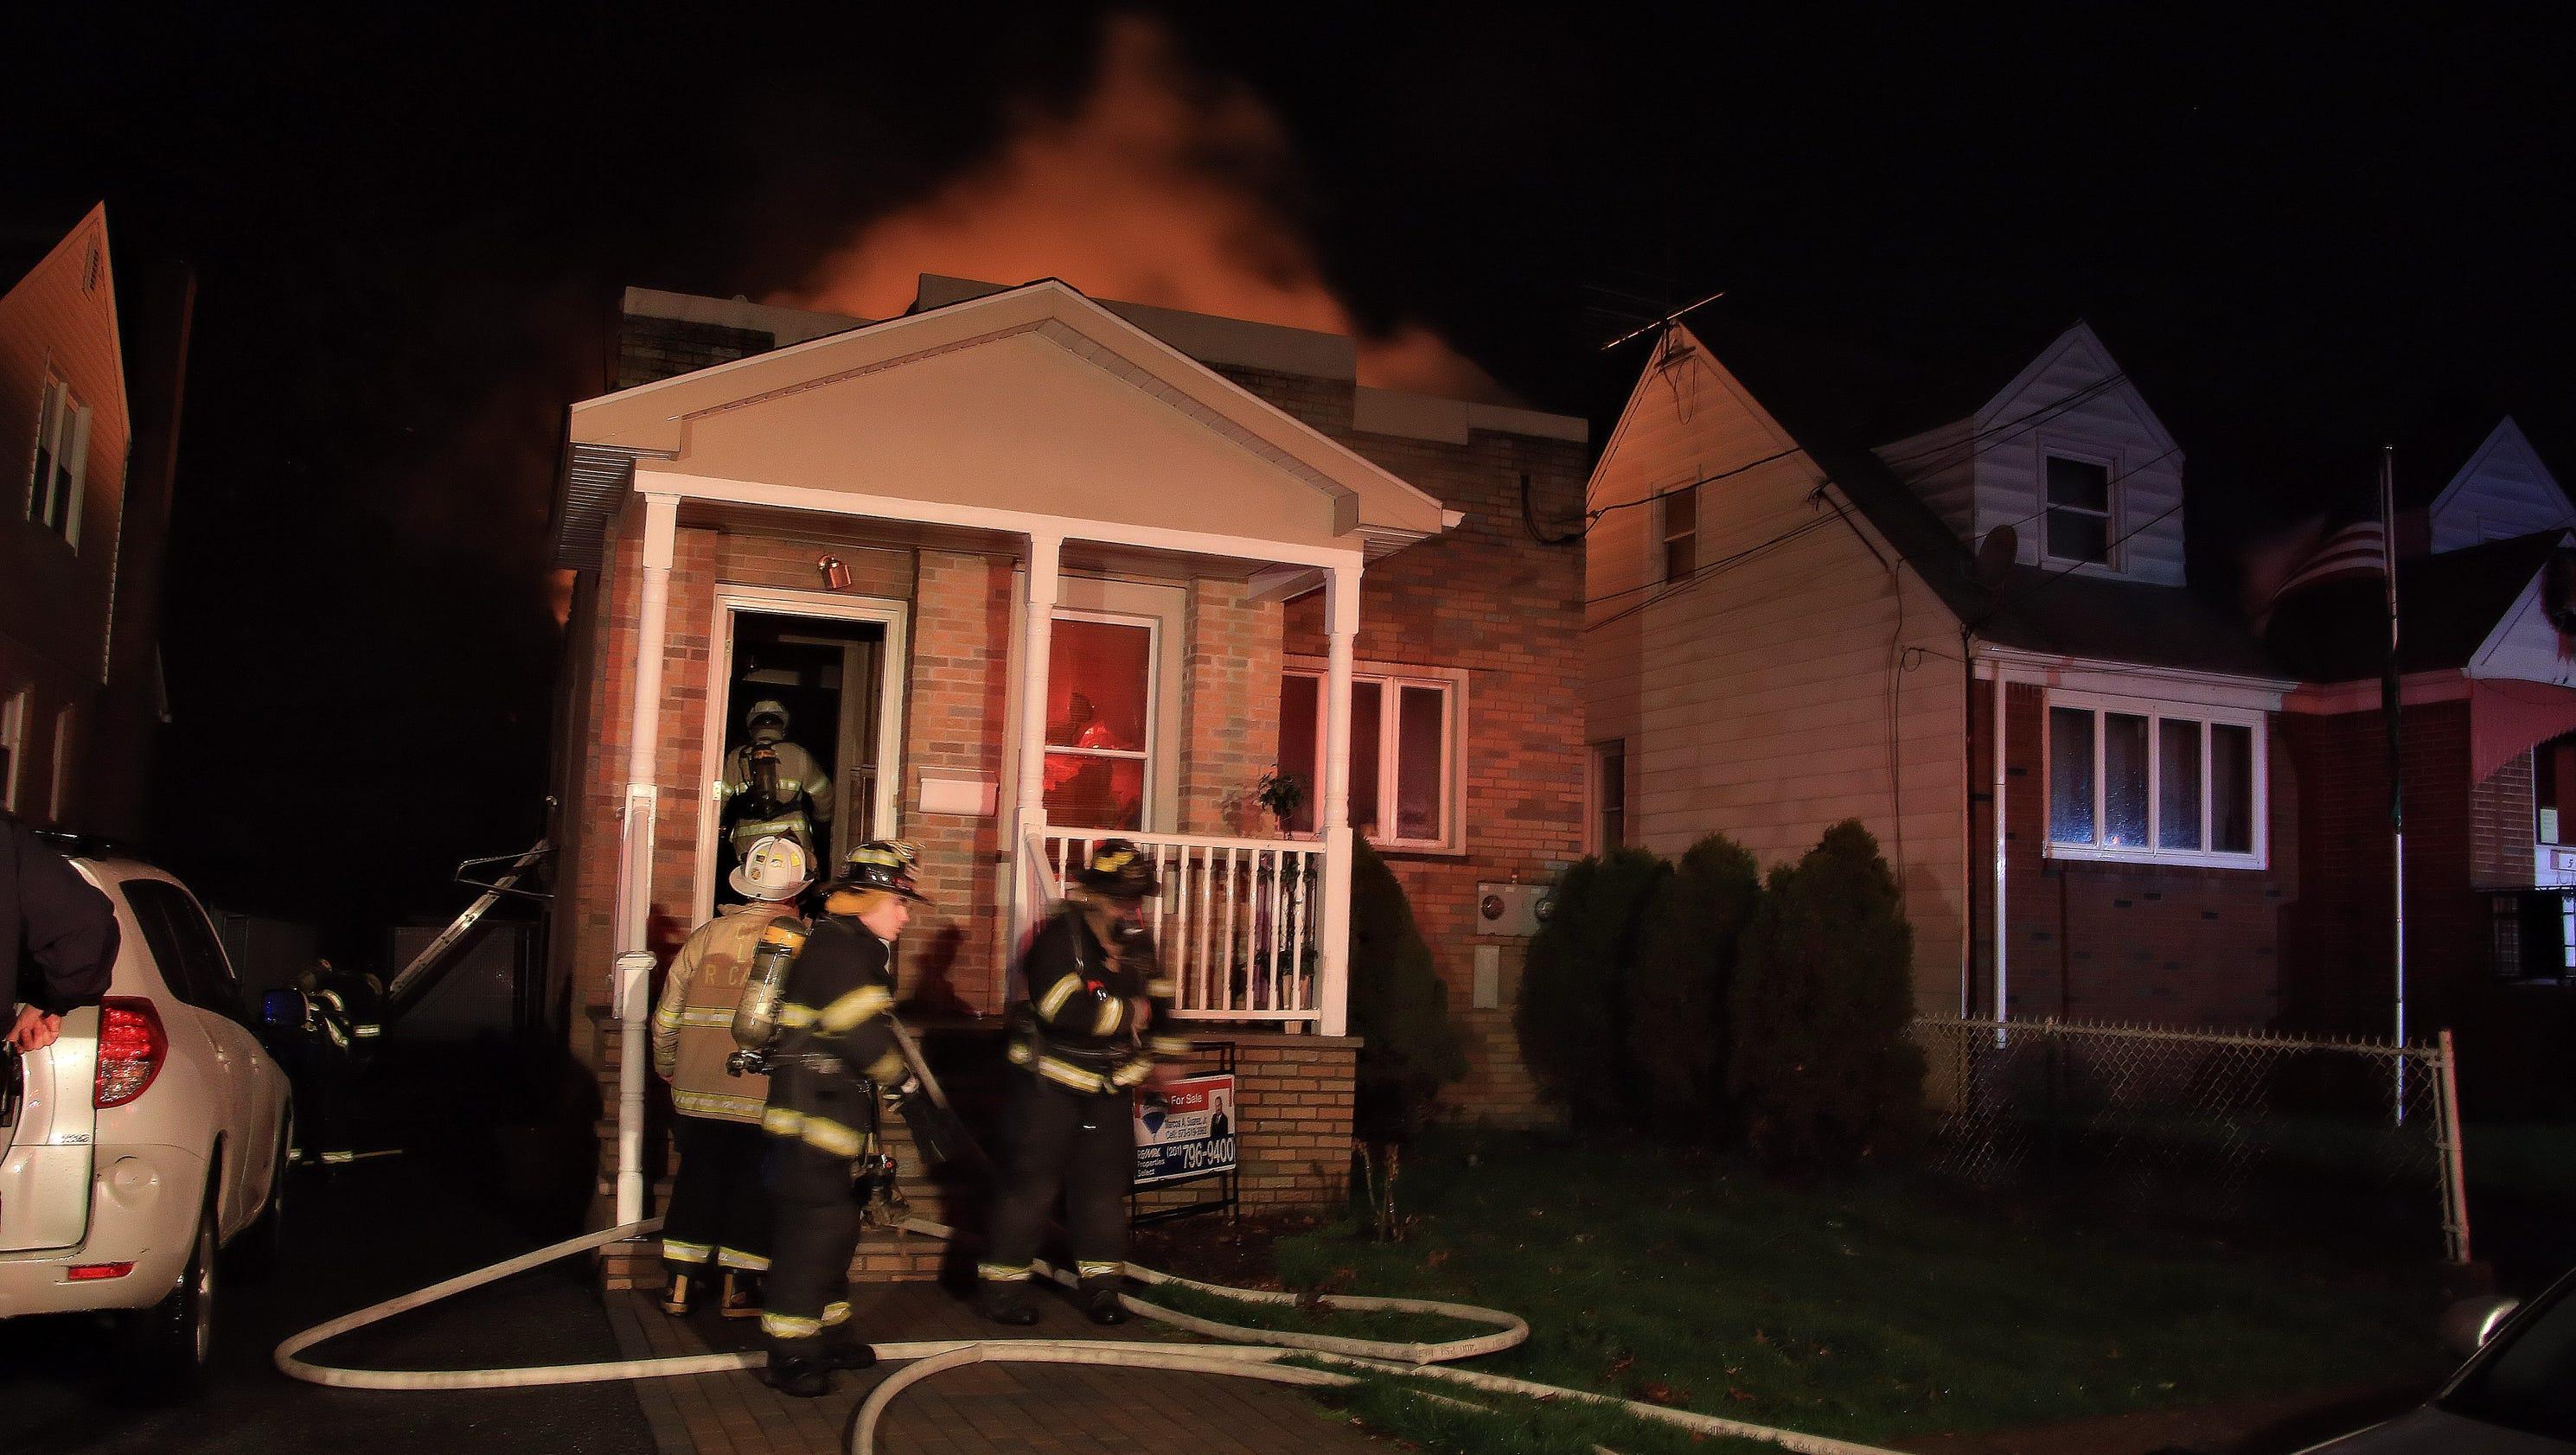 essay house on fire a house on fire essay for kids essay a house  firefighters battle early morning blaze in lodi